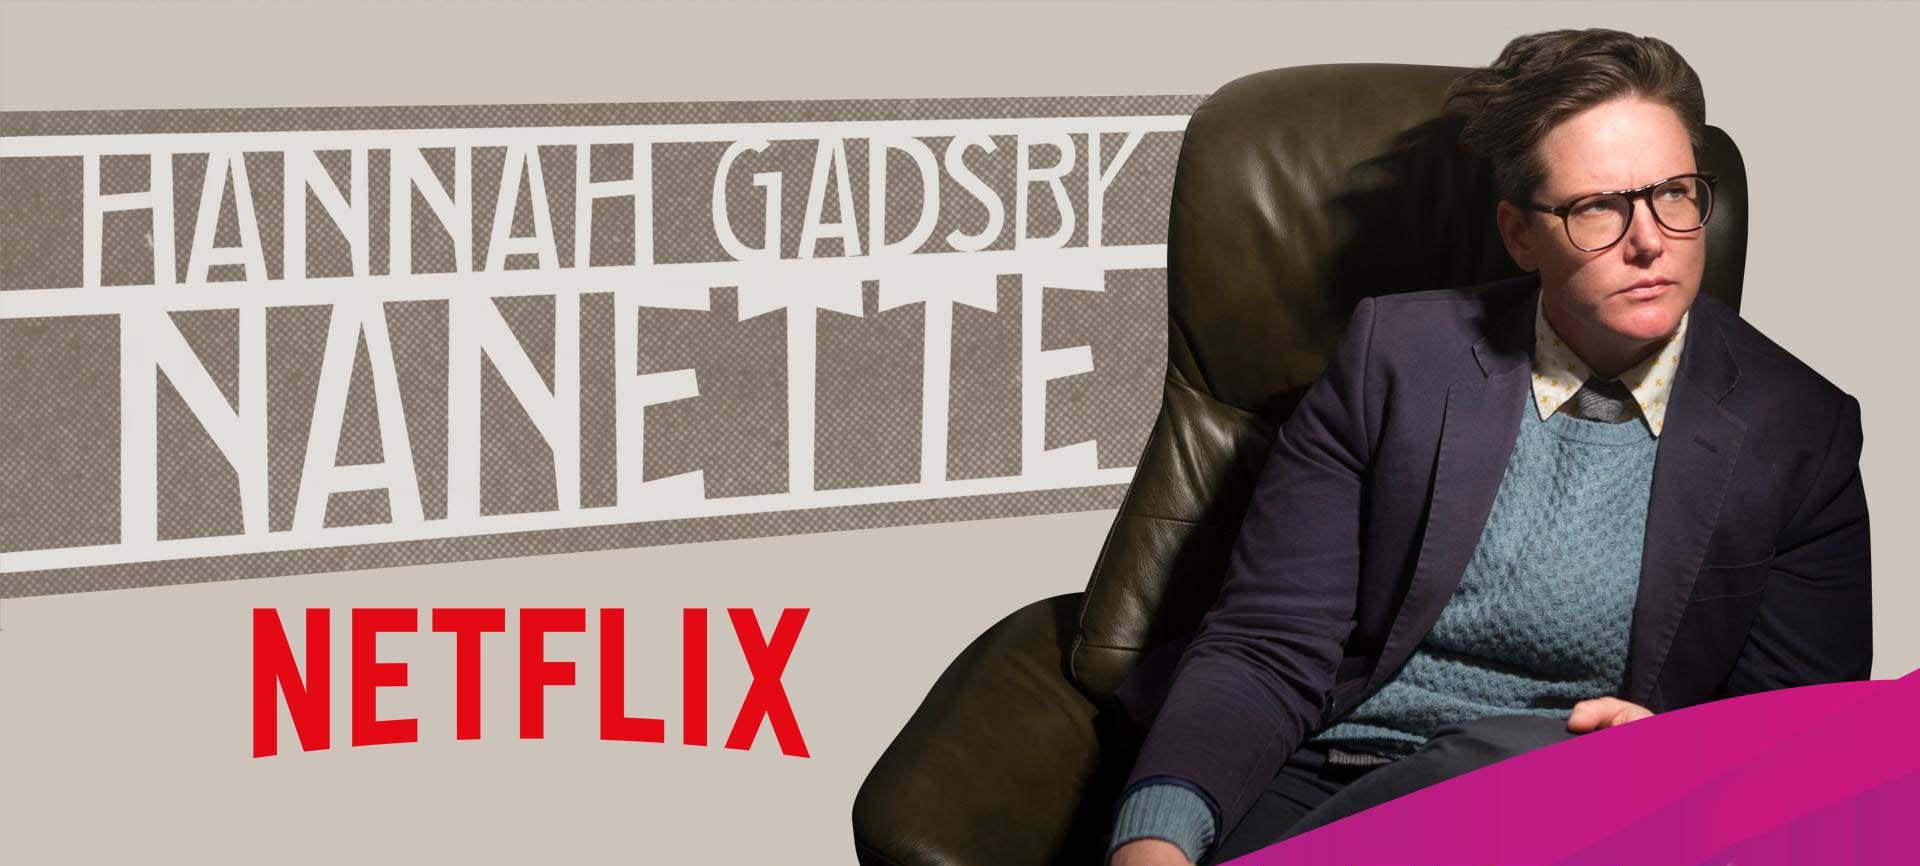 Hannah Gadsby's Nanette arriva su Netflix